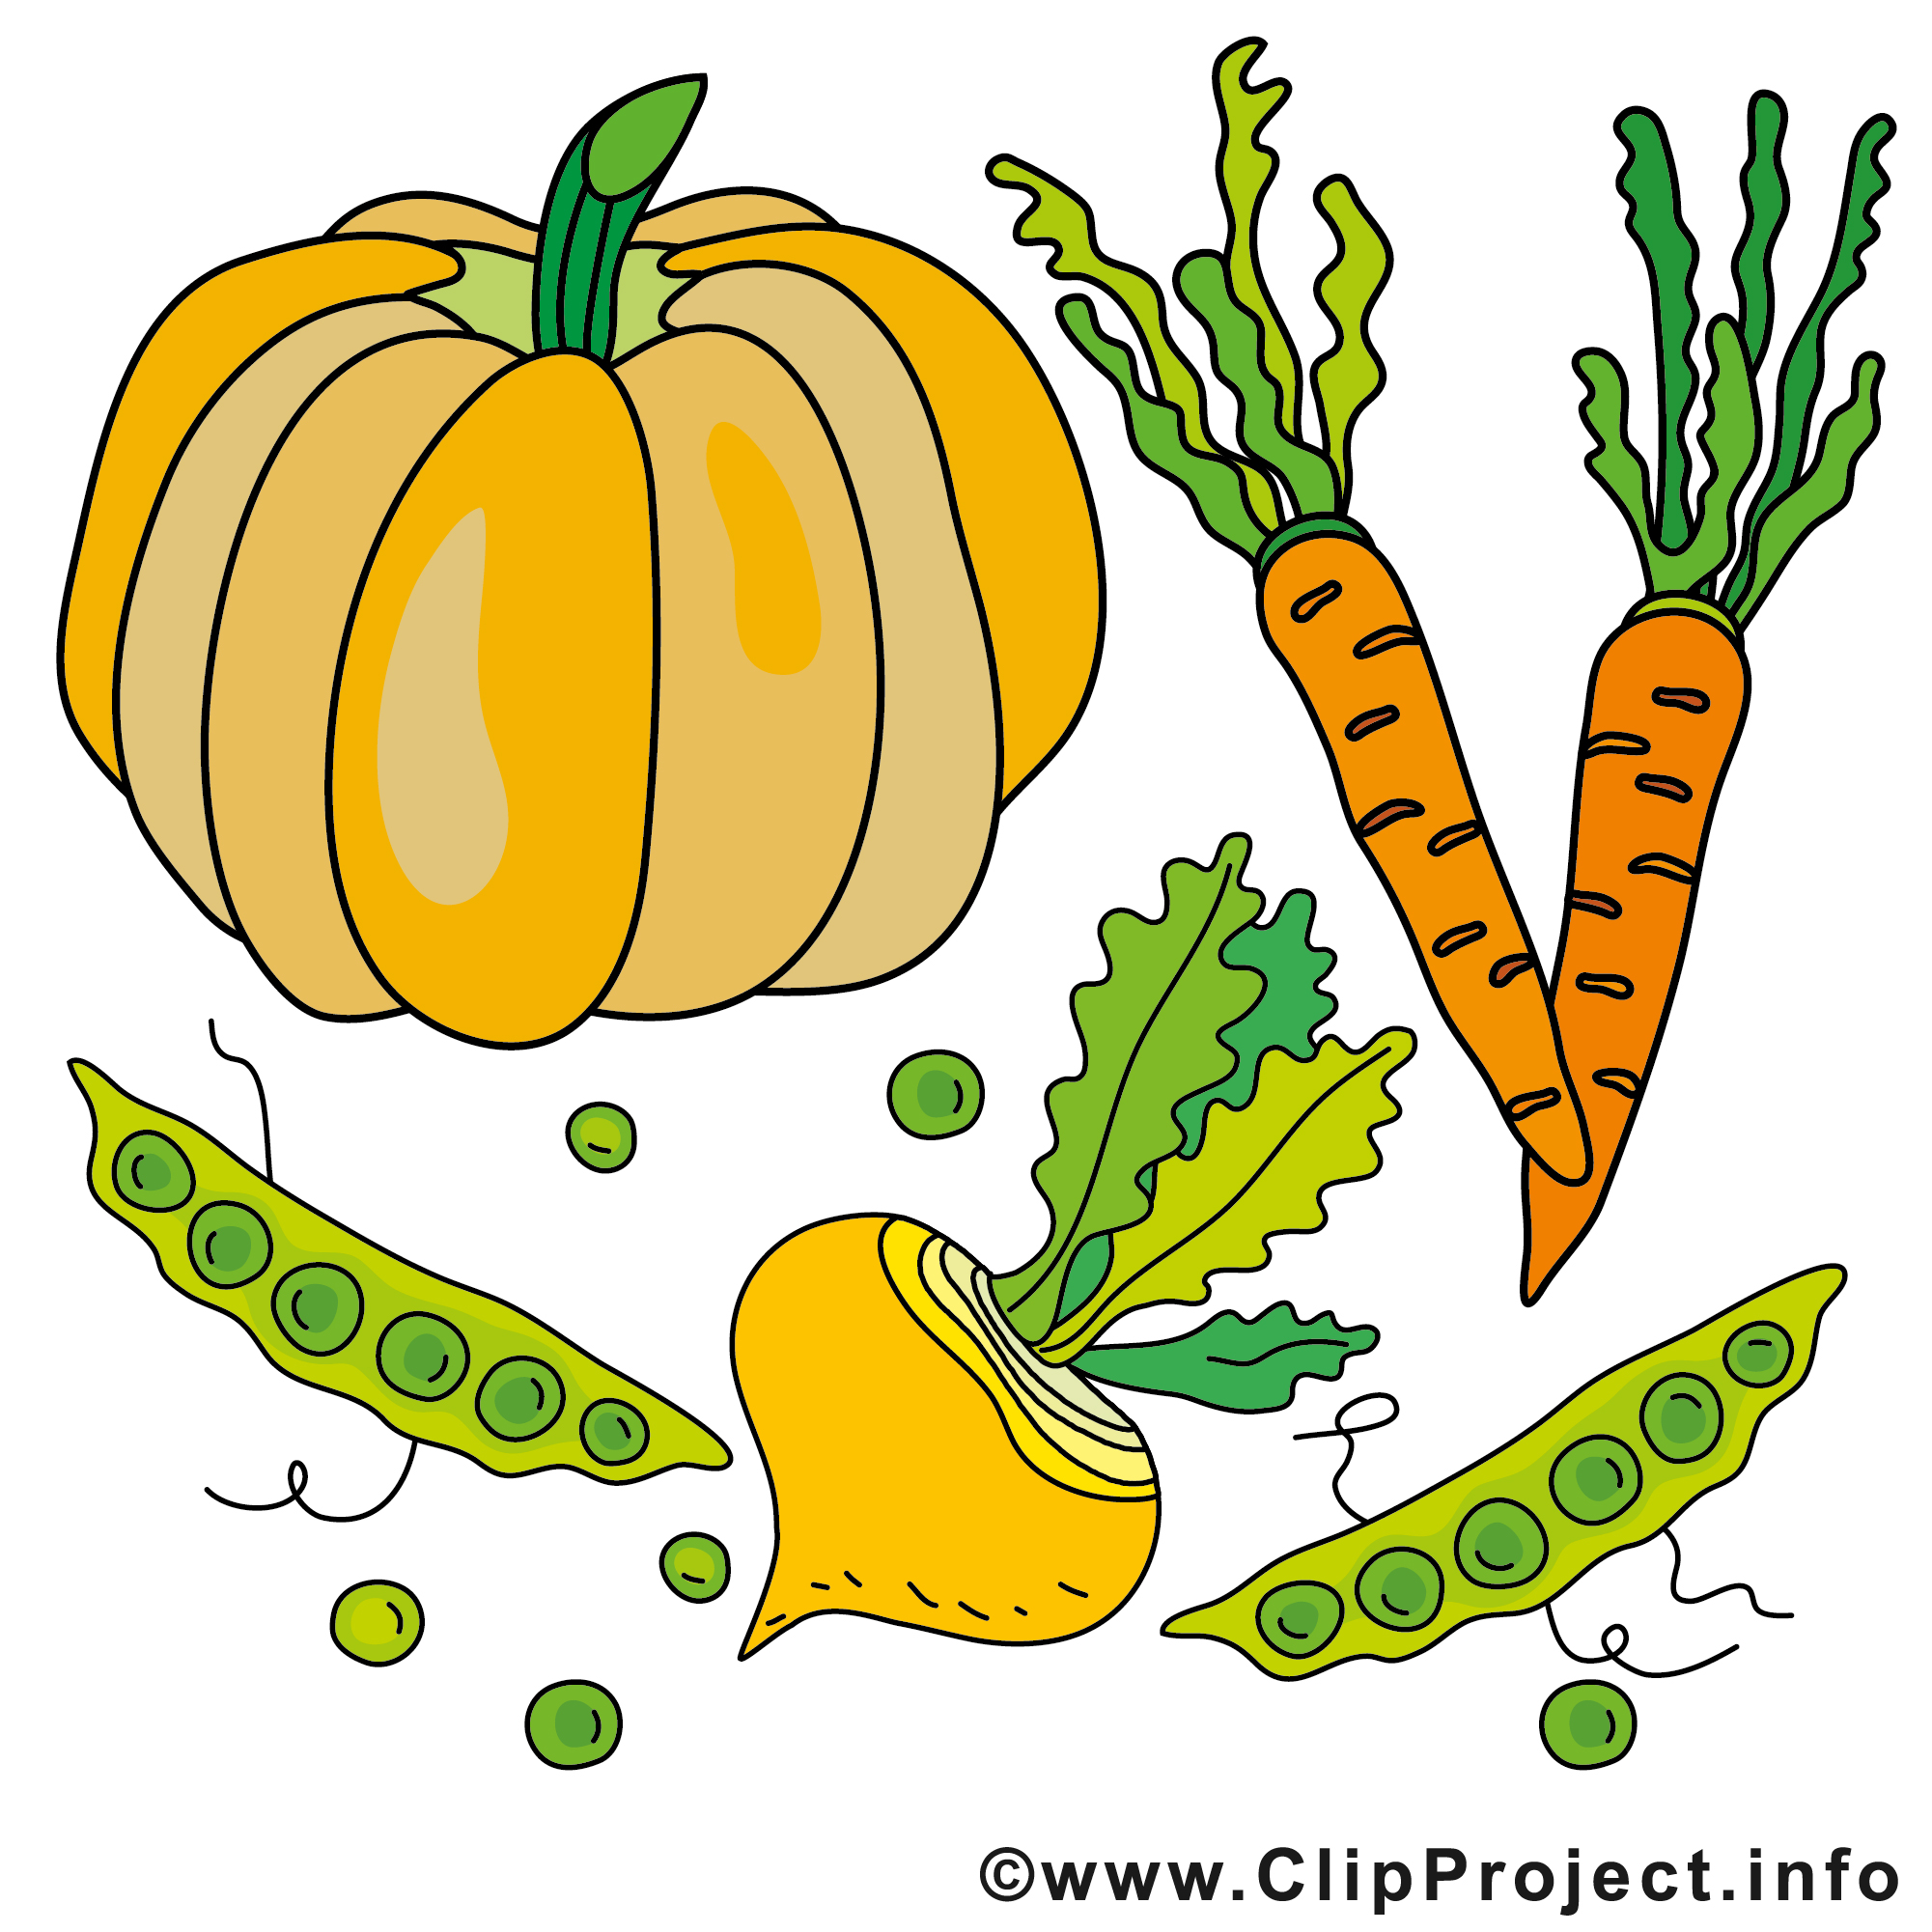 Bilder clipart png freeuse stock Gemüse clipart - ClipartFest png freeuse stock